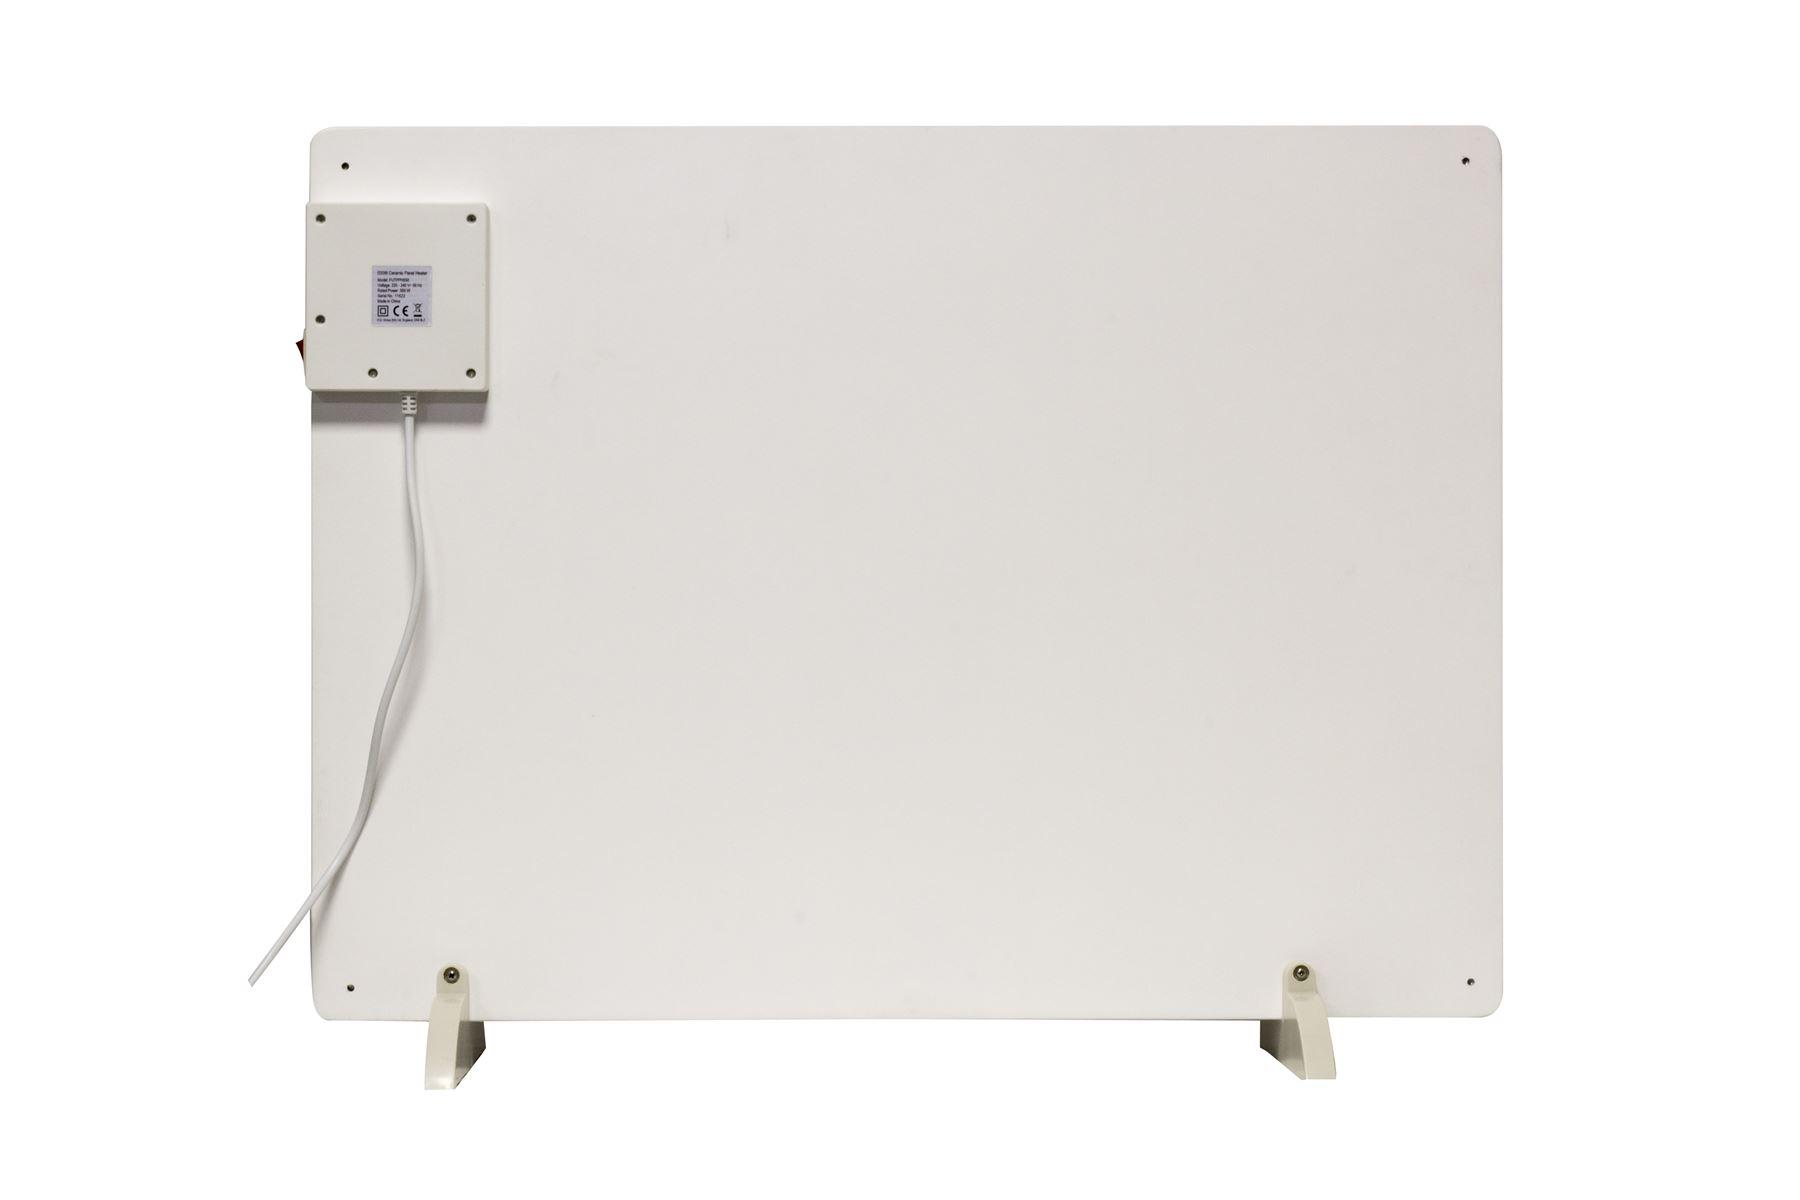 Futura 550W Ceramic Paintable ECO Panel Heater & 24Hr Timer | eBay